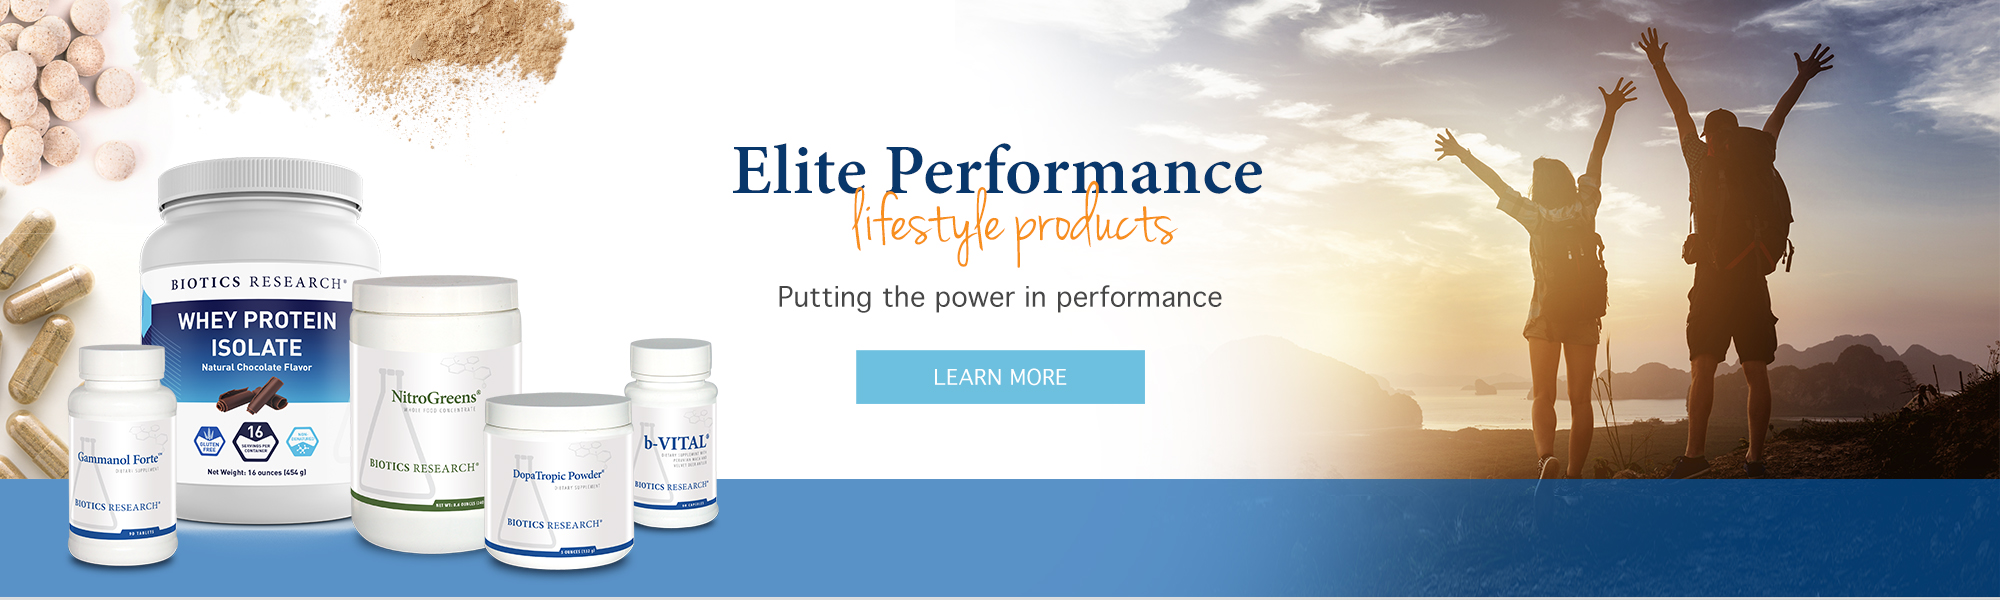 Elite Performance_Banner